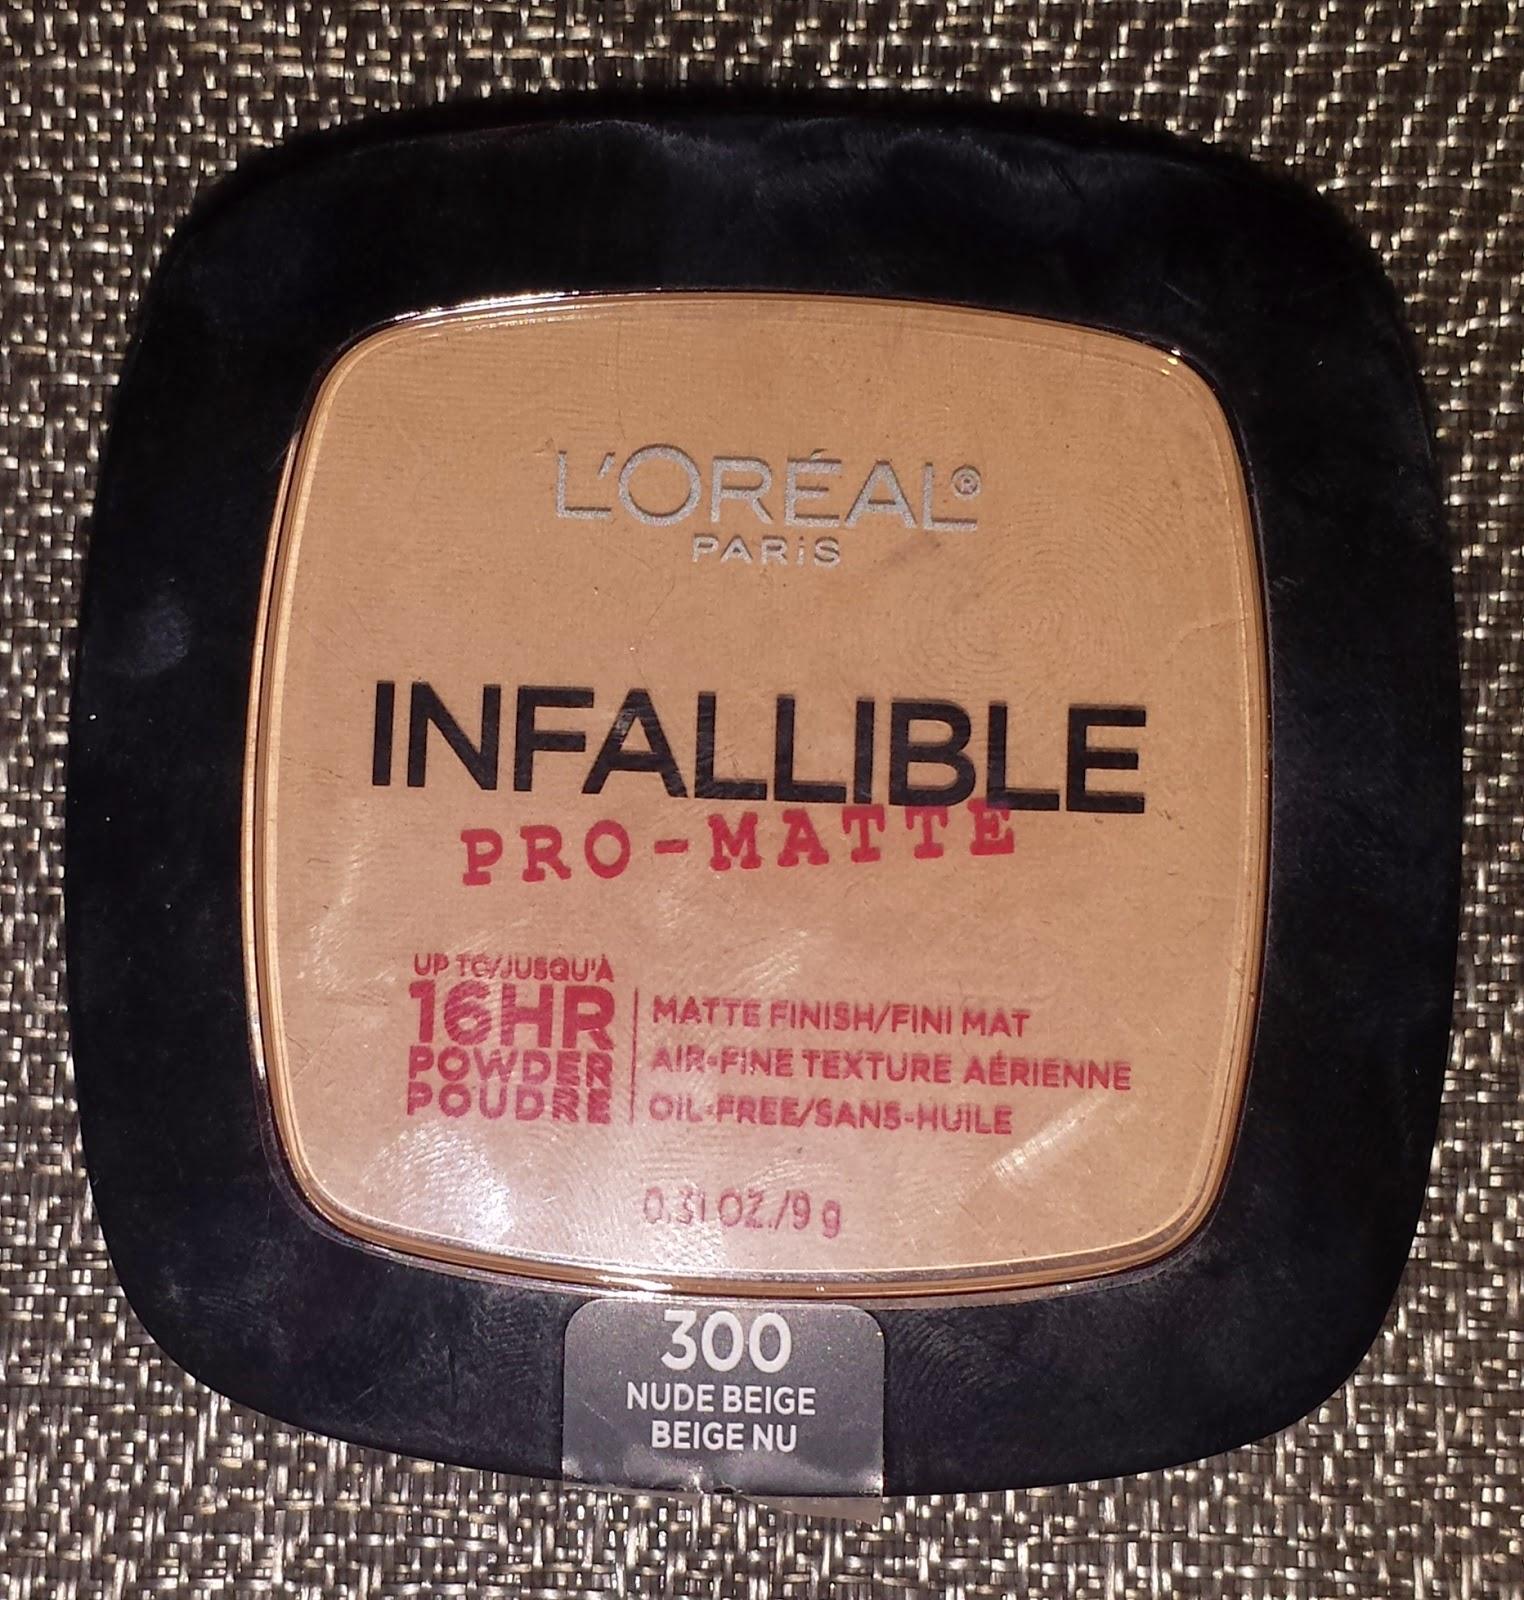 L'Oreal Infalliable Pro-Matte 16 Hr. Powder